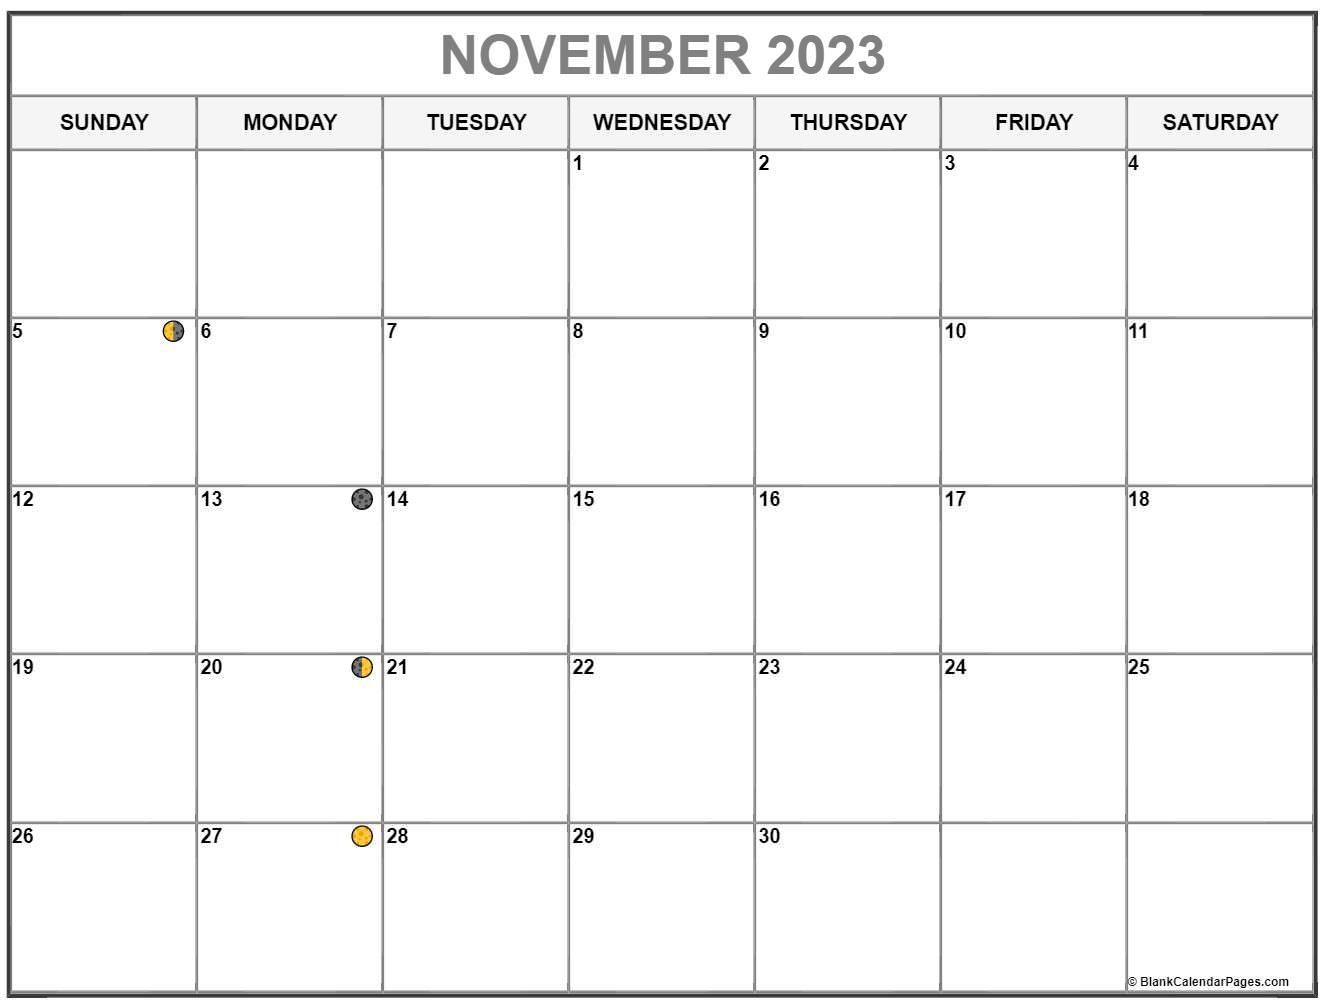 November Lunar Calendar